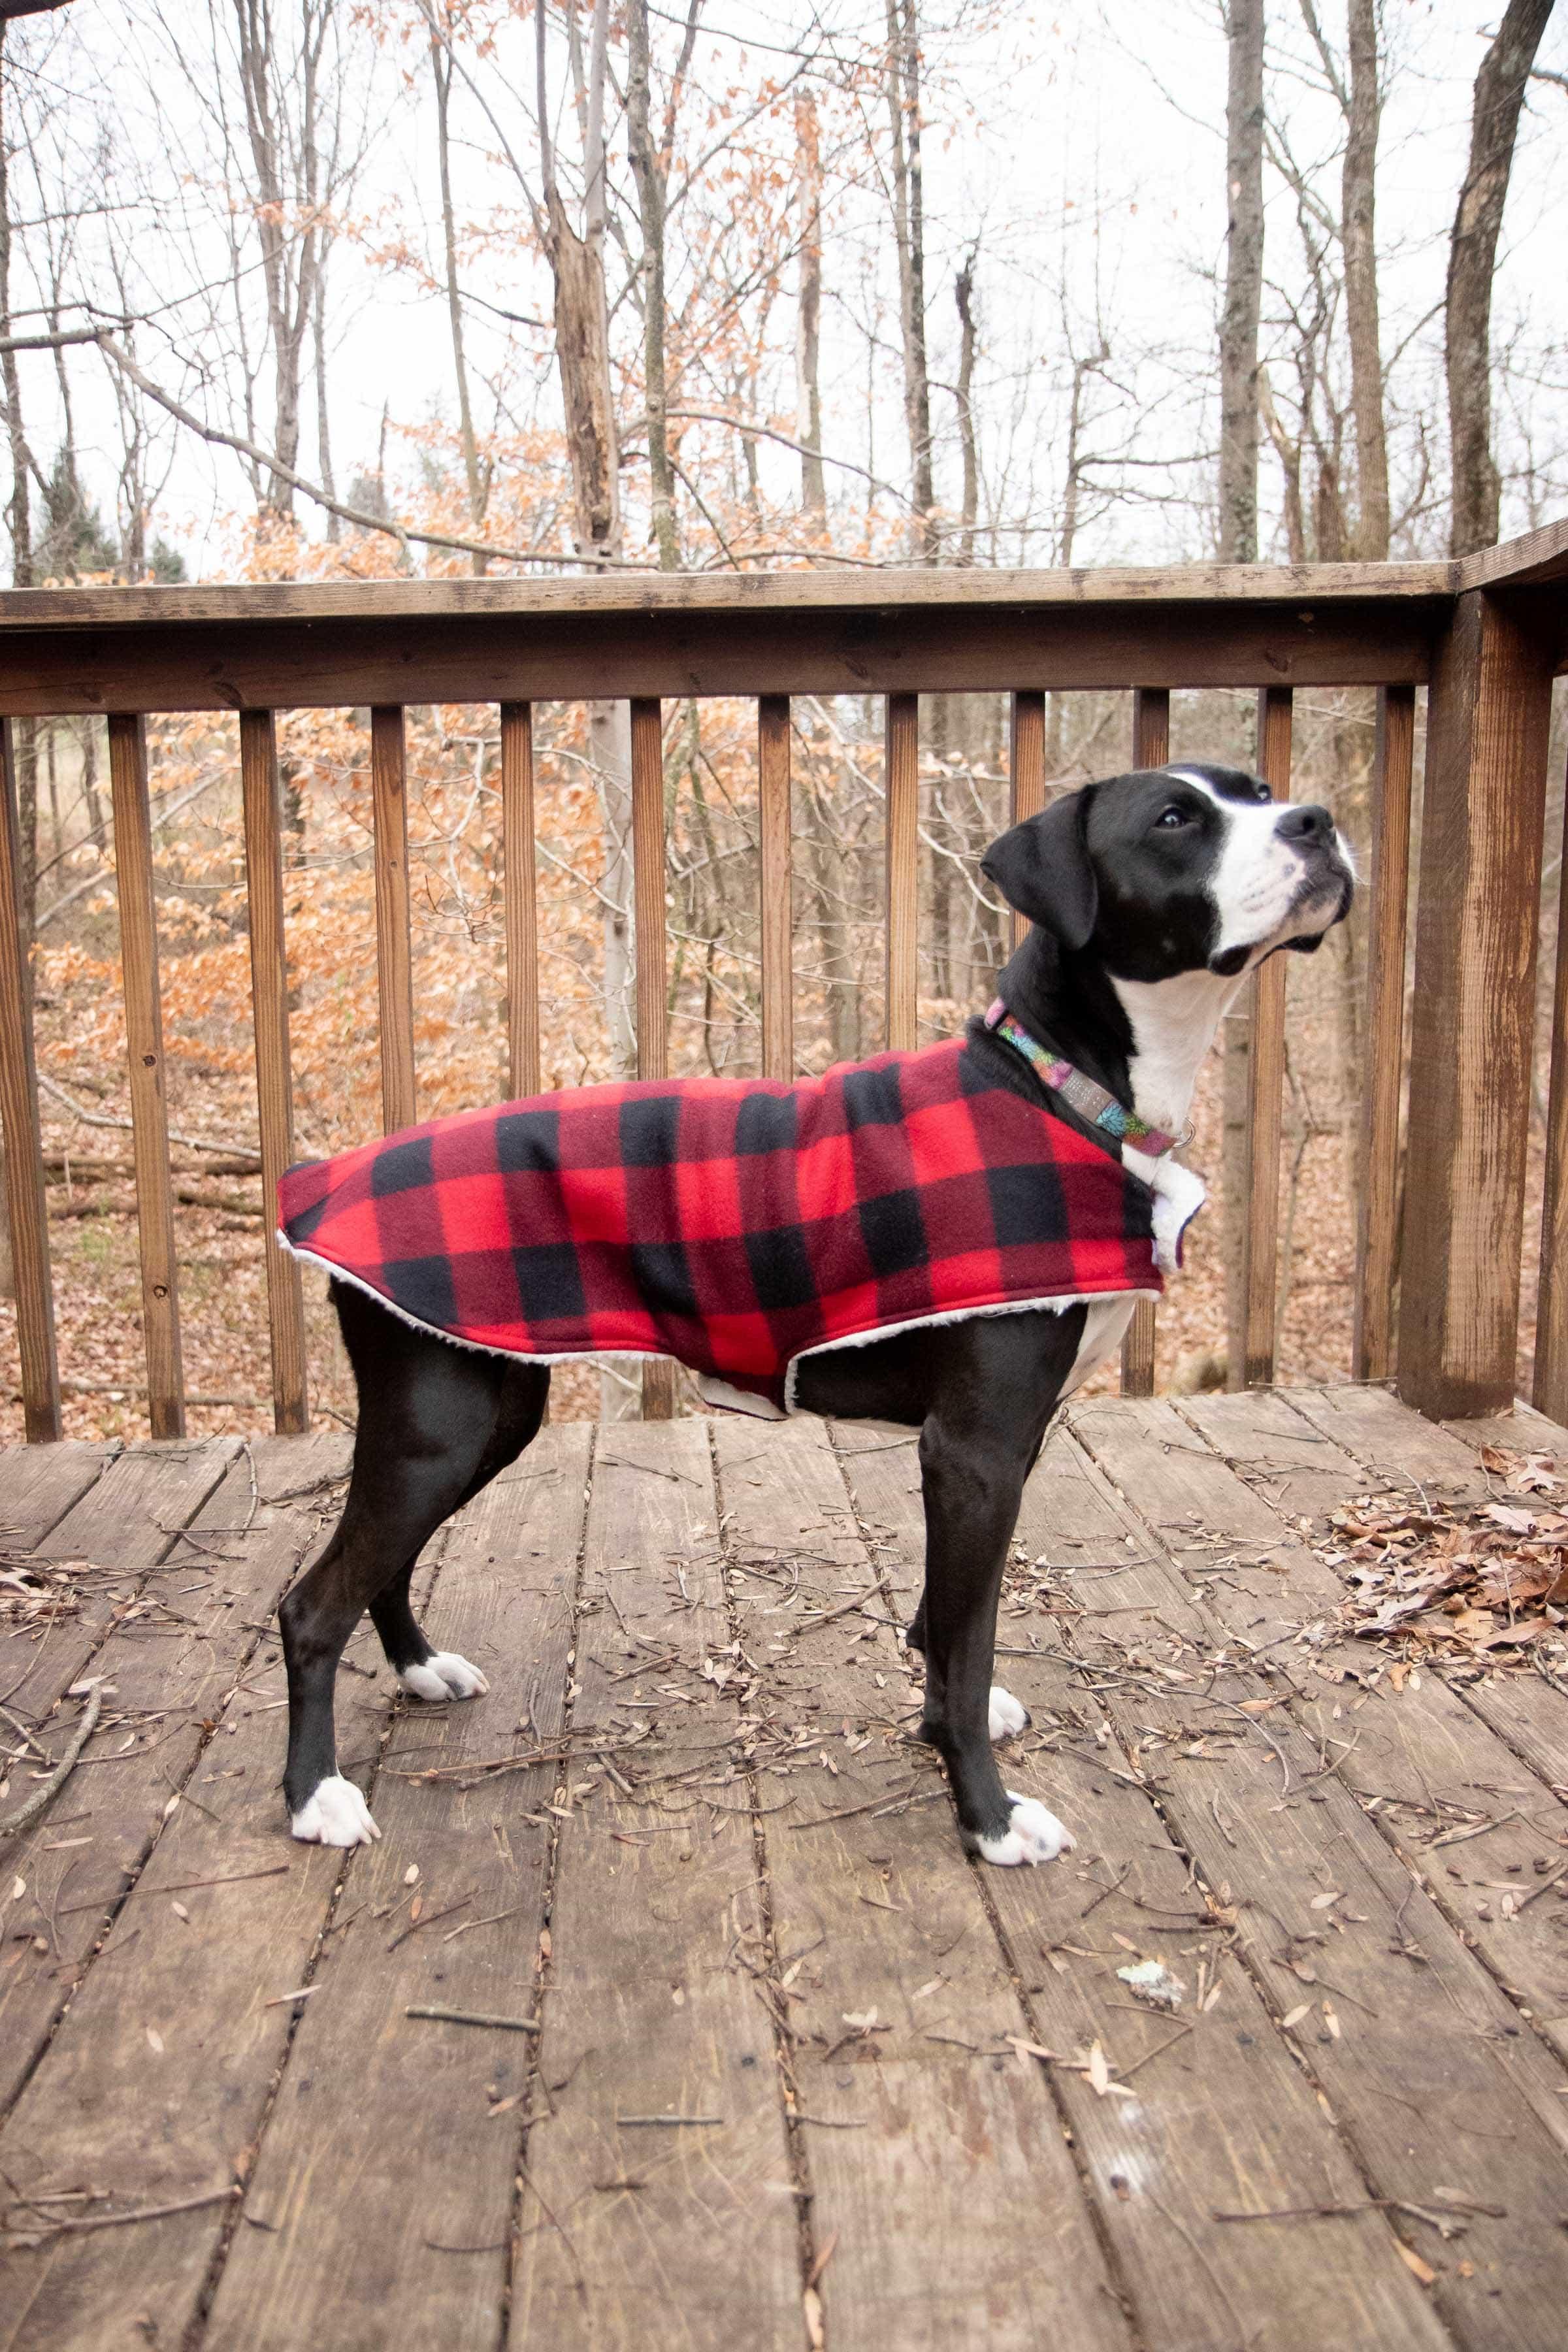 Black and white dog wearing a plaid custom dog coat outside